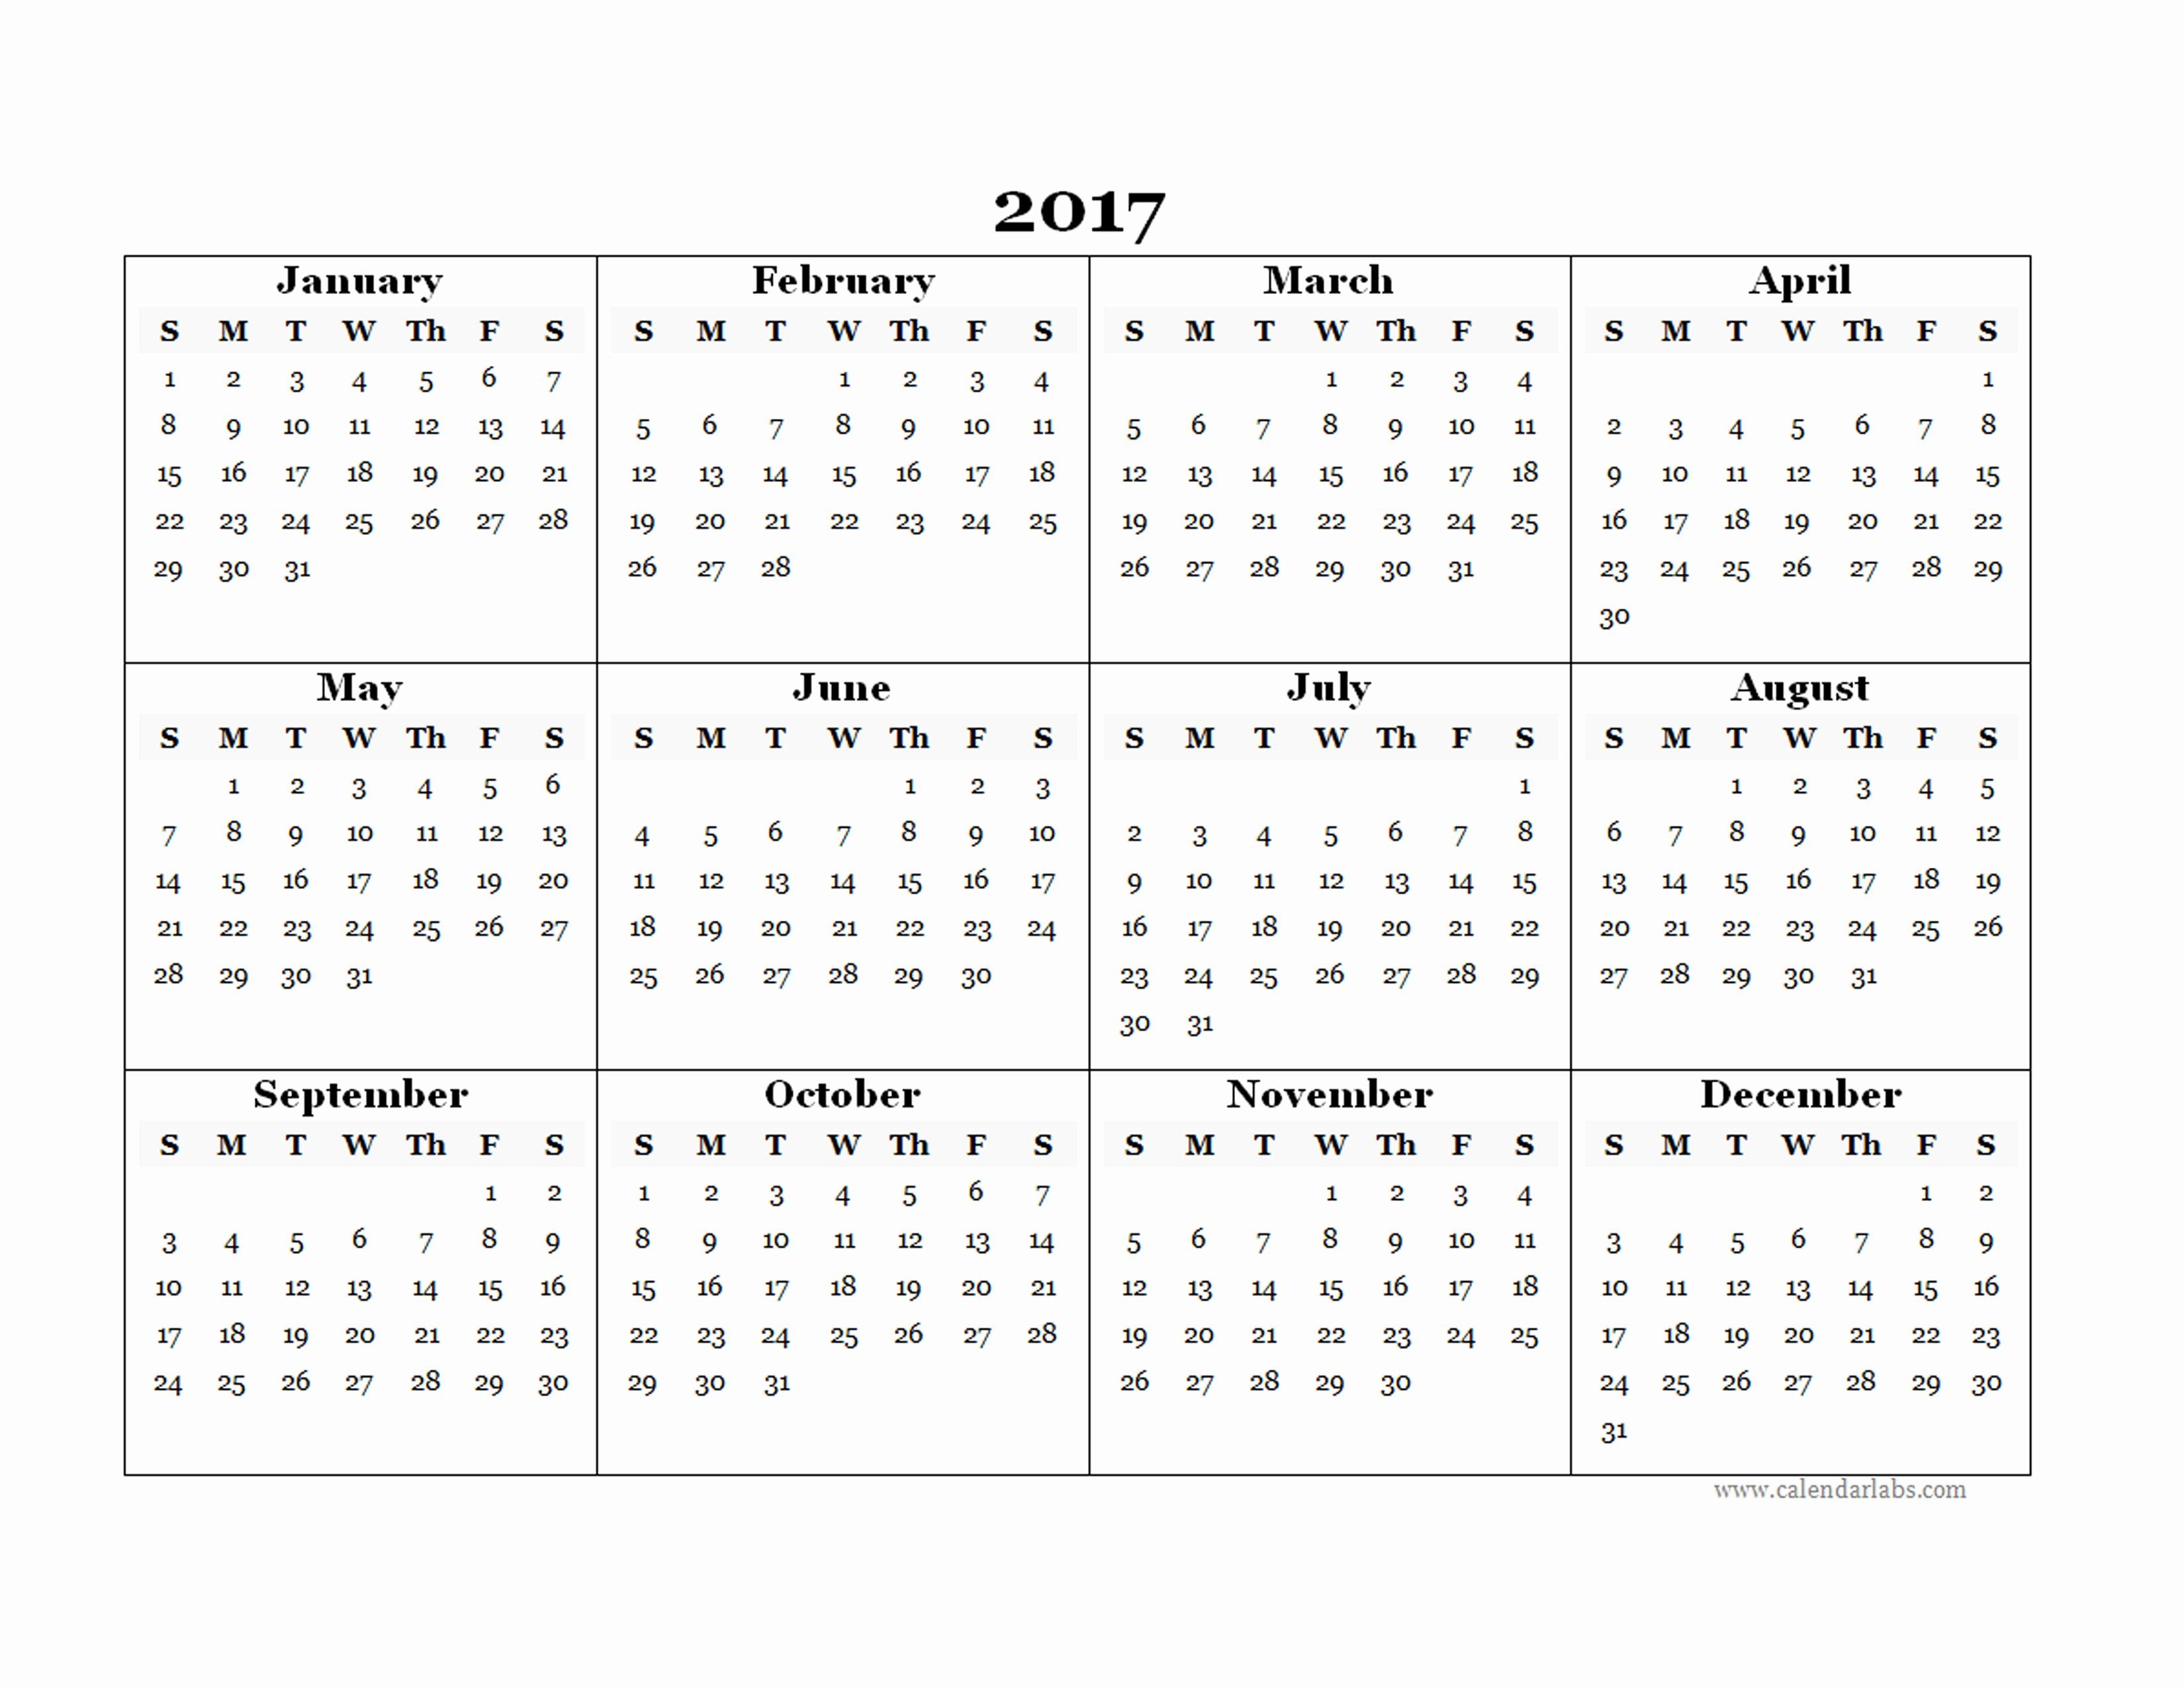 2017 Full Year Printable Calendar Luxury 2017 Blank Yearly Calendar Template Free Printable Templates